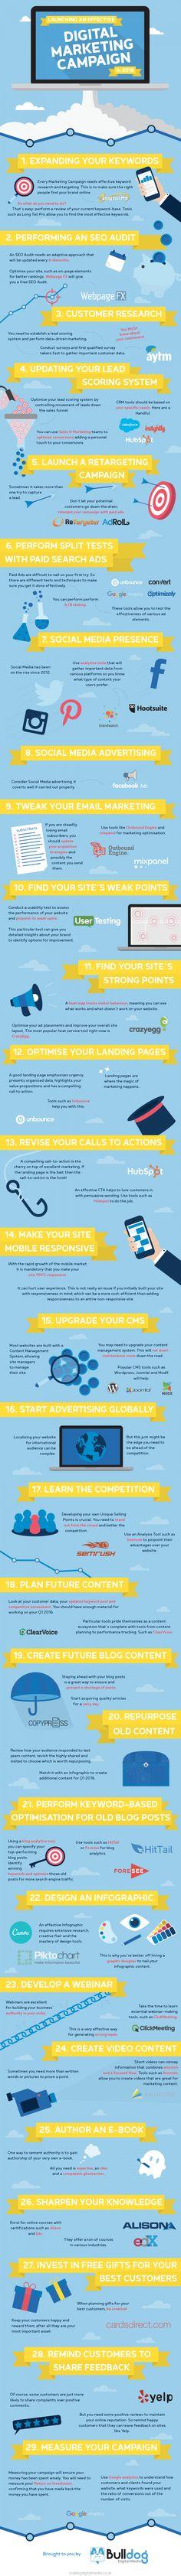 29 components of #digital #marketing